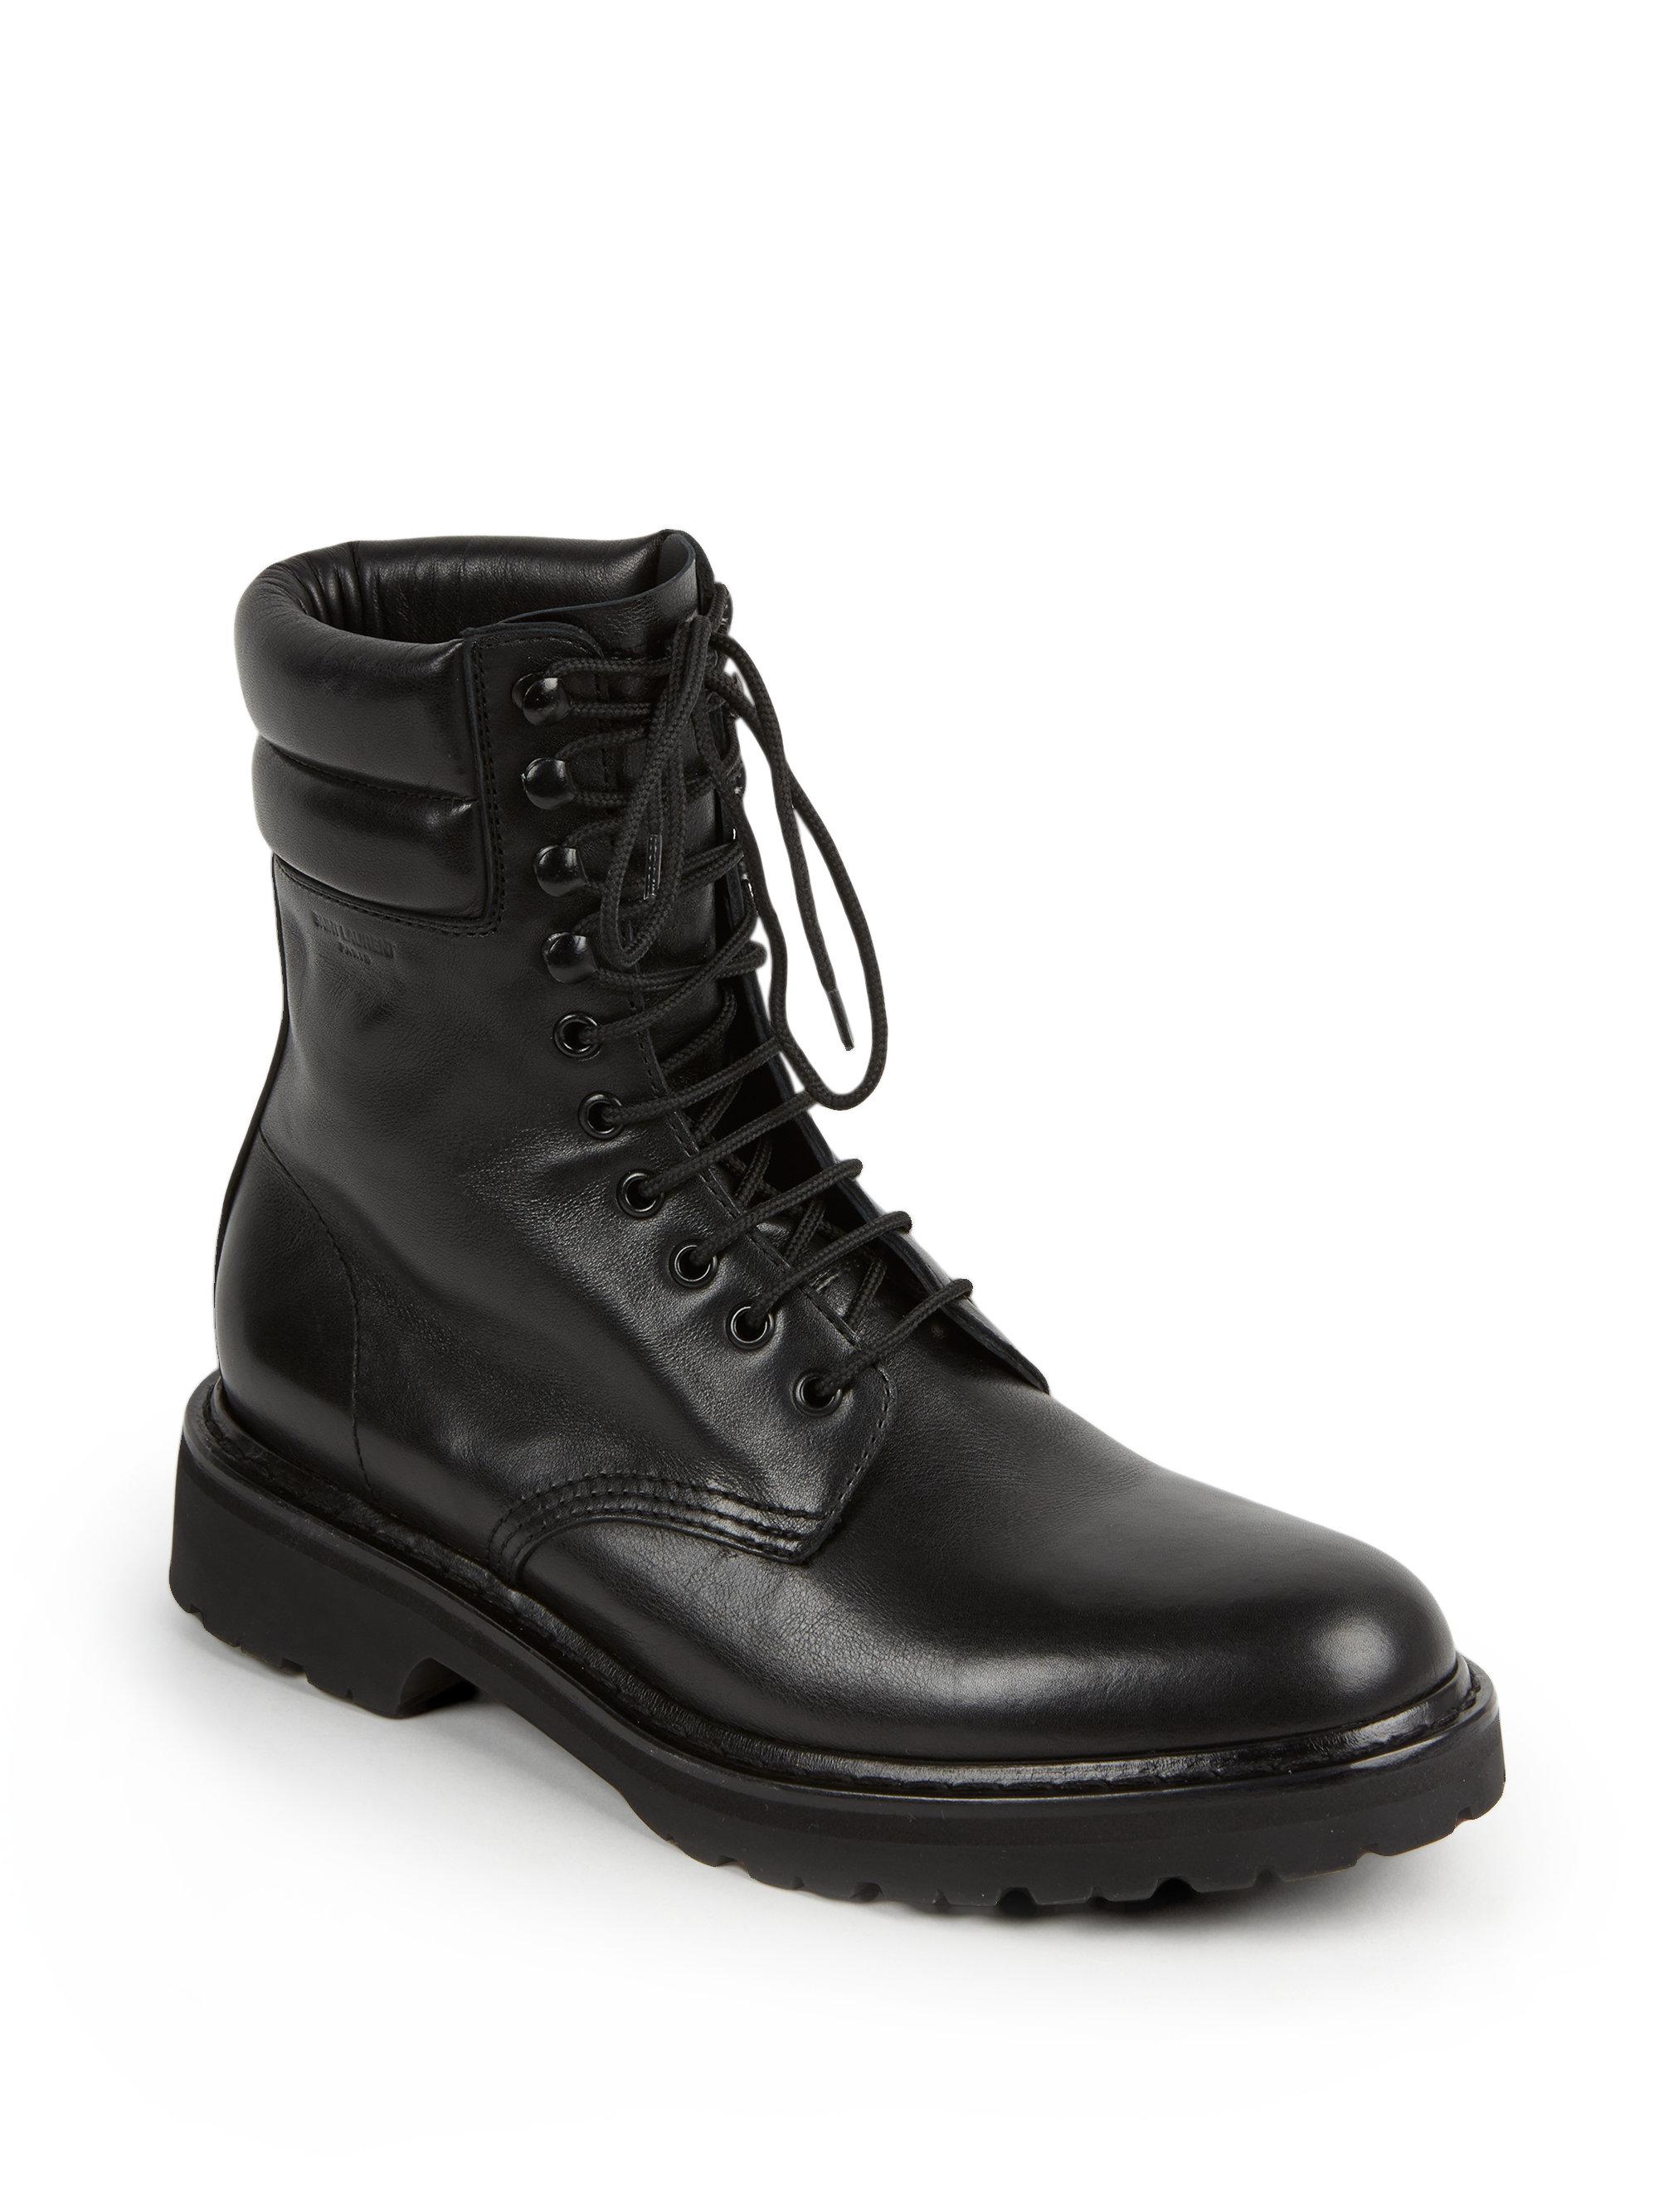 Lyst Saint Laurent Trekker 25 Leather Lace Up Boots In